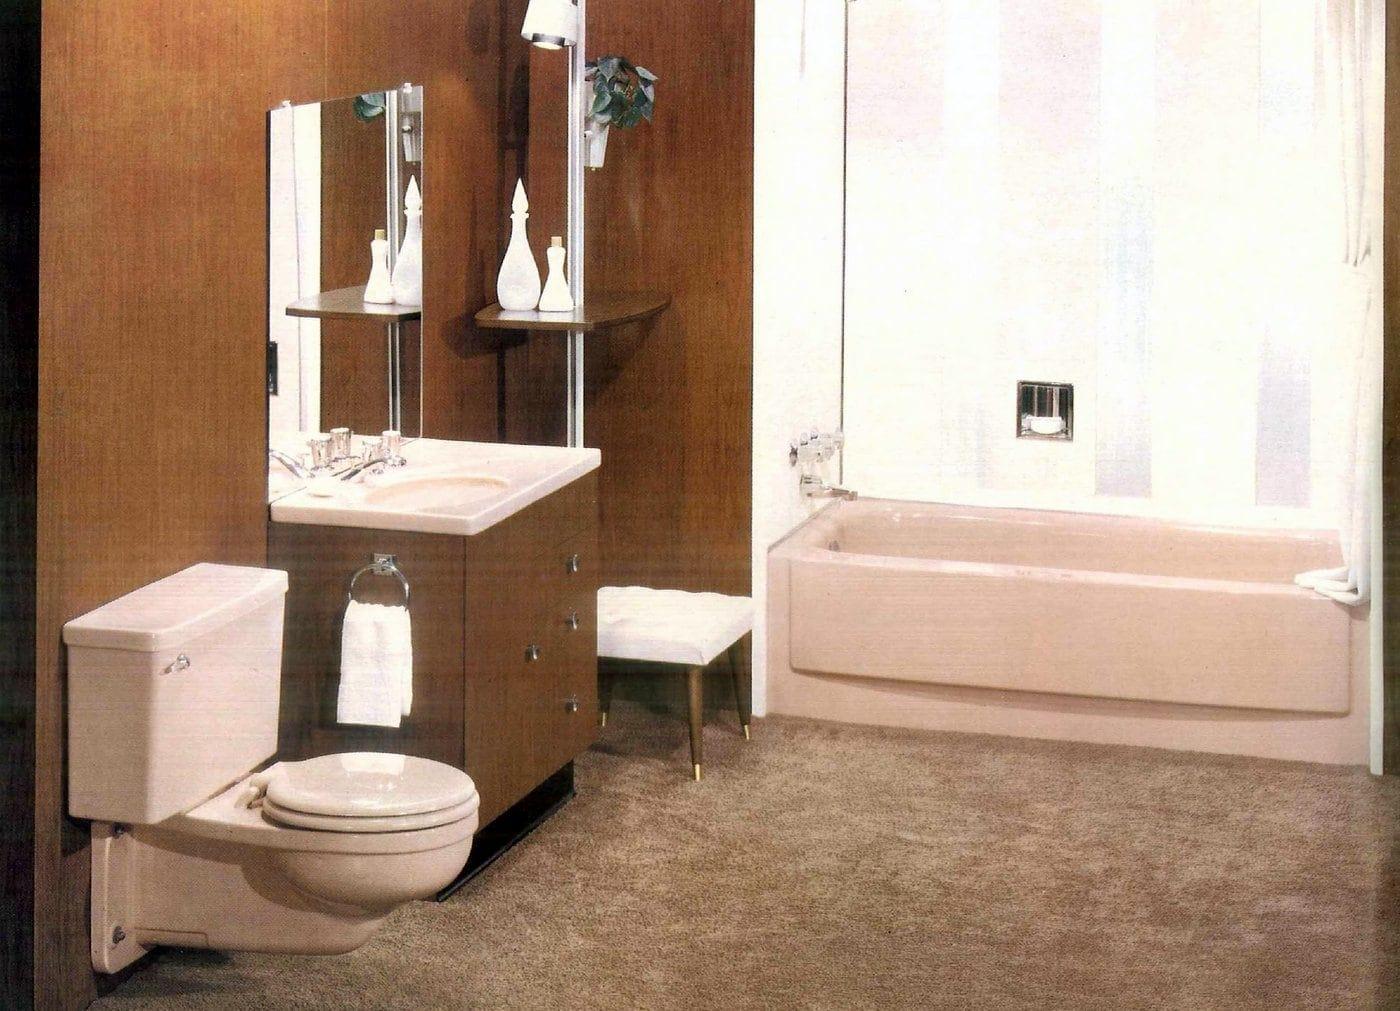 Sixties bathroom decorating ideas - 1960 (2)